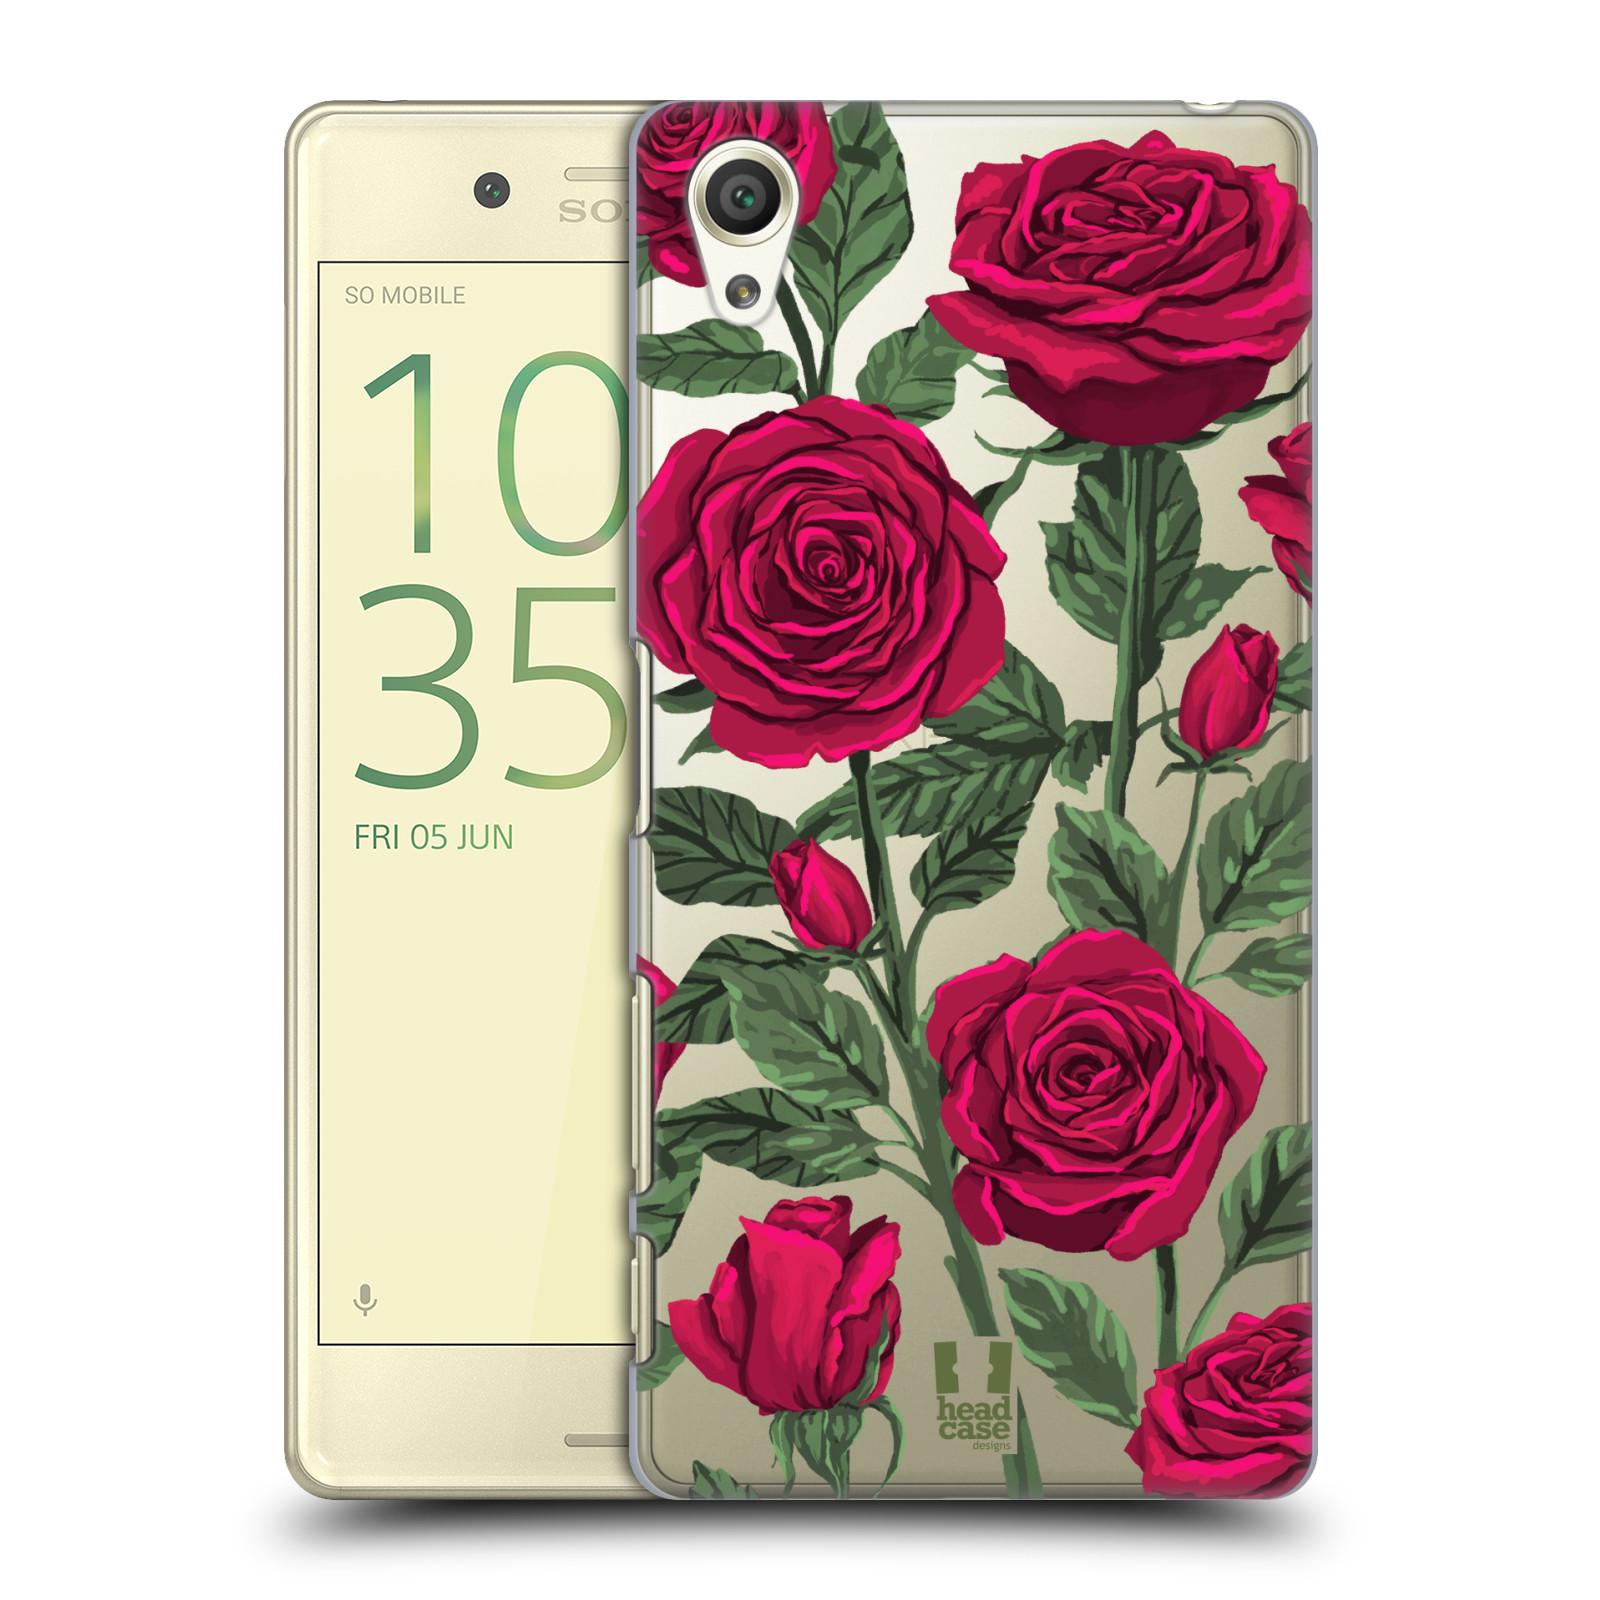 Pouzdro na mobil Sony Xperia X - HEAD CASE - květina růže